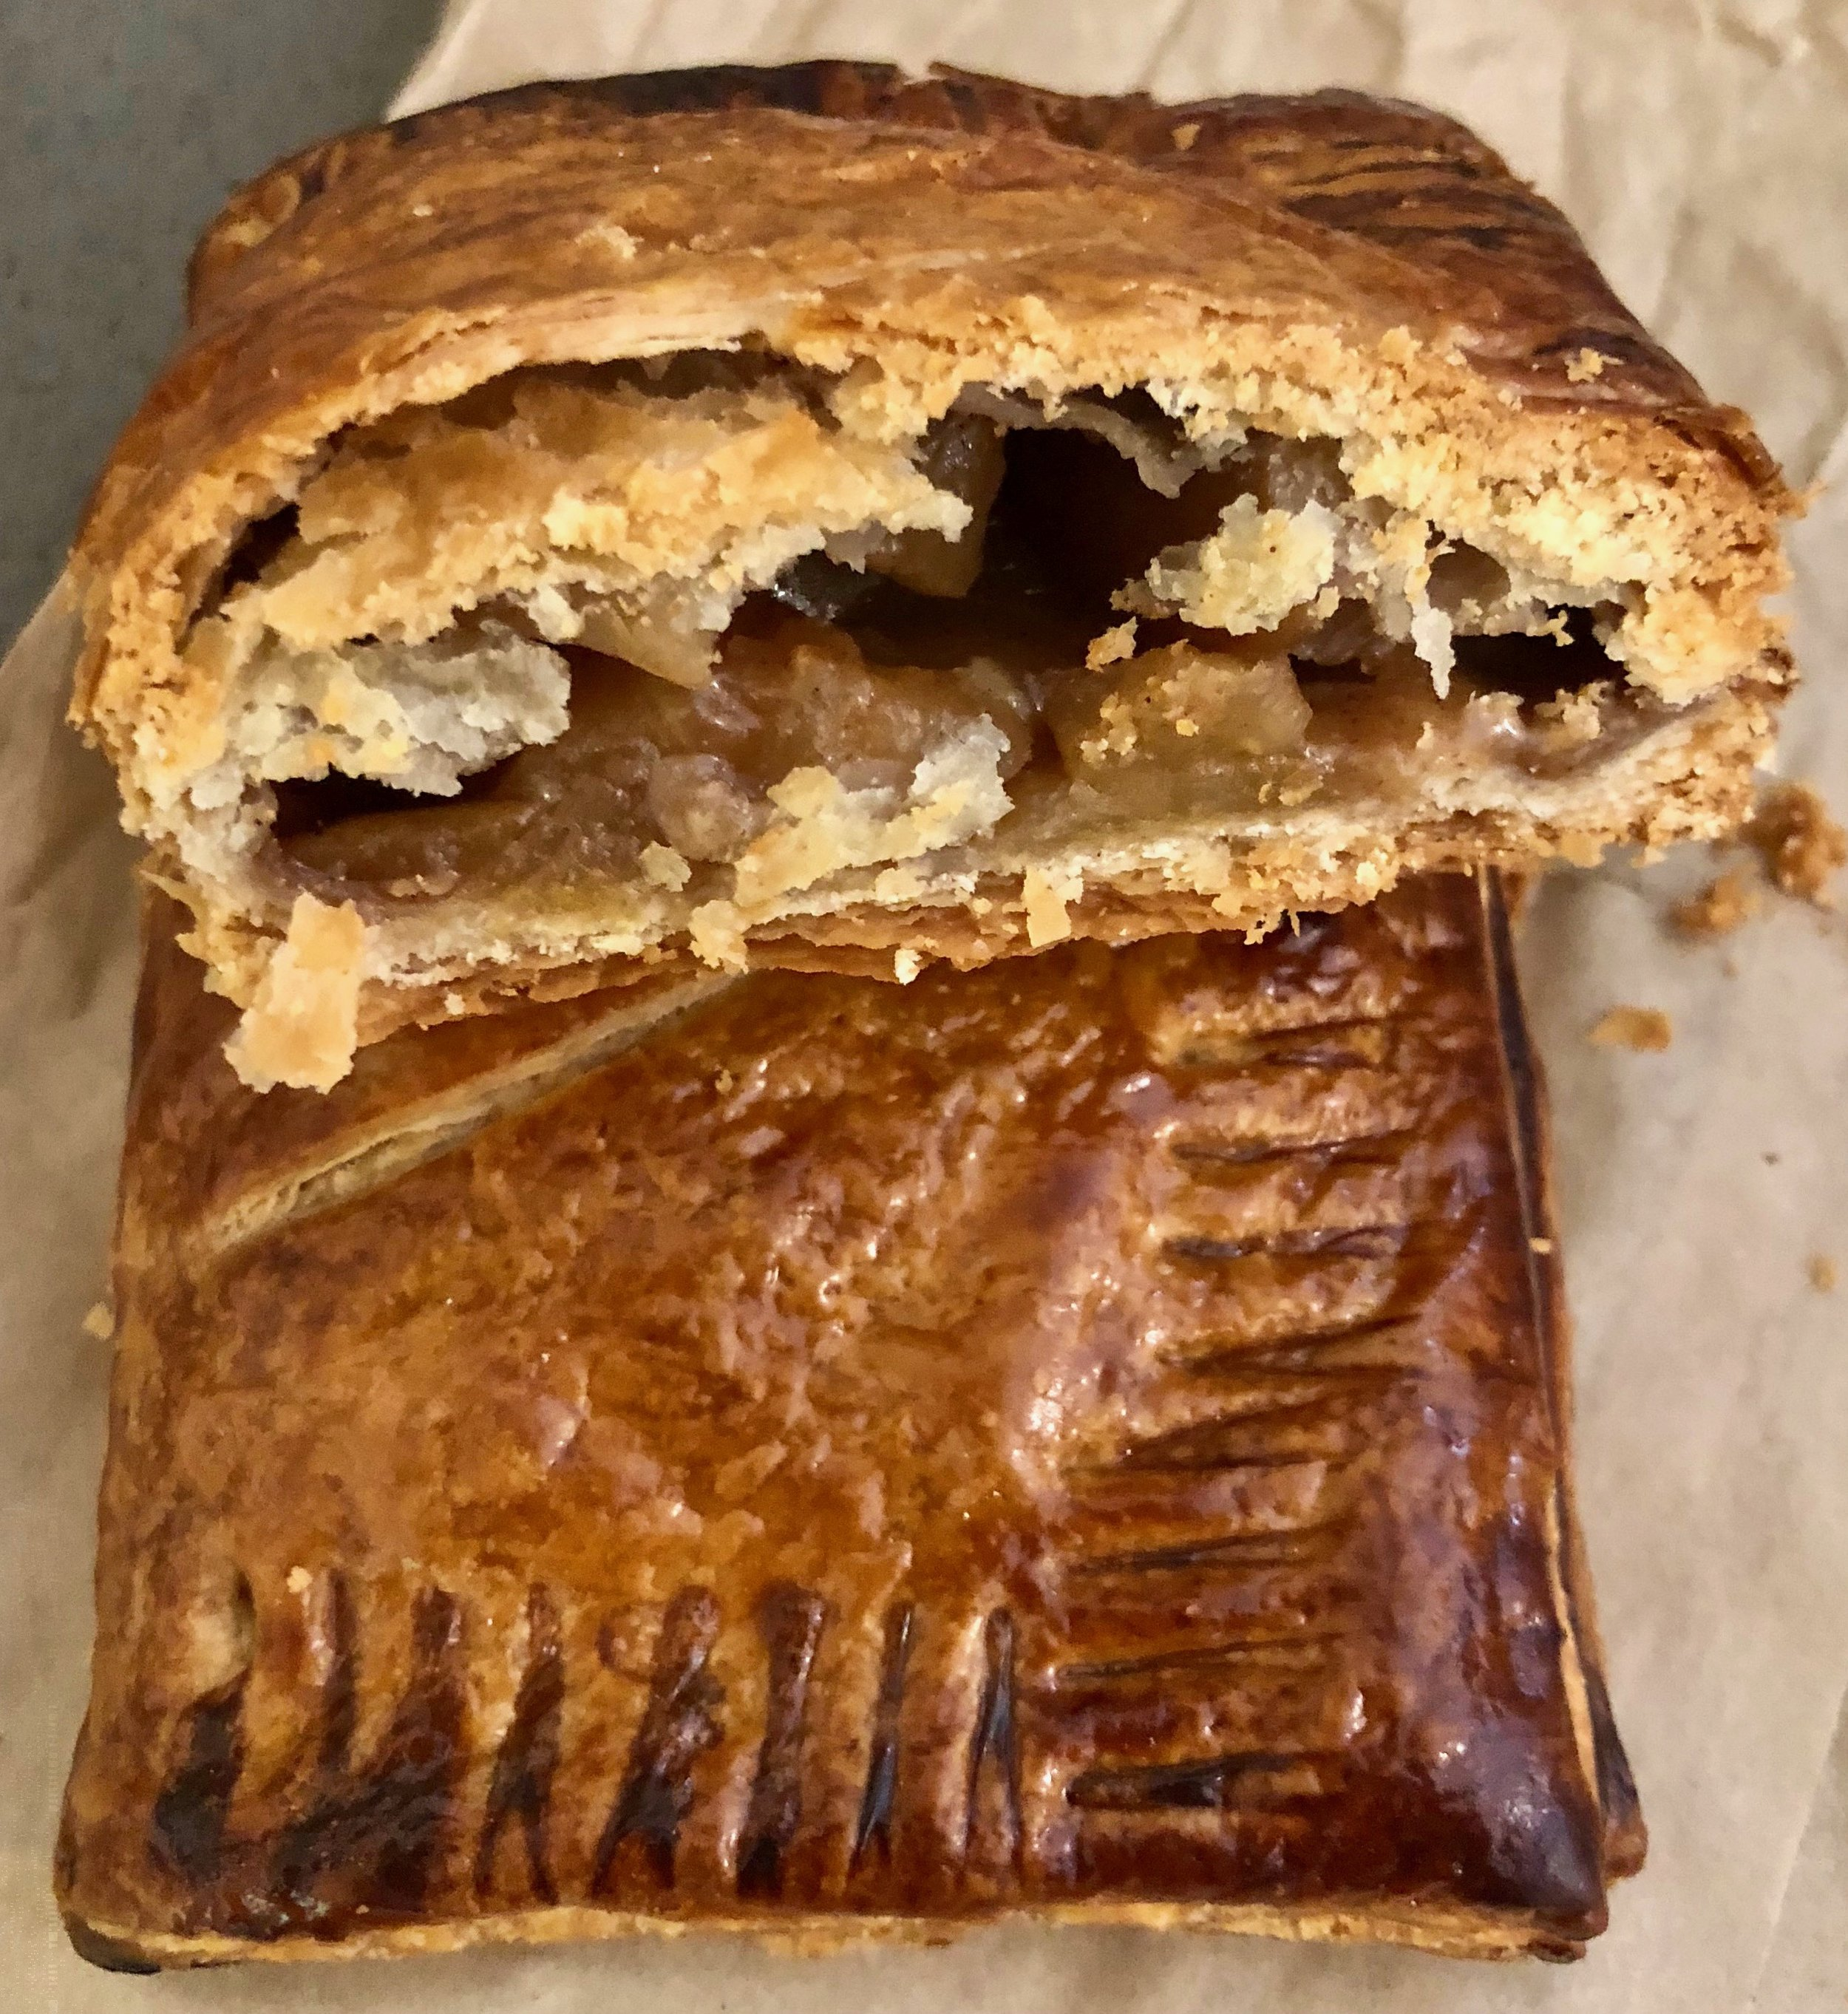 apple hand pie from Neighbor Bakehouse $4.25